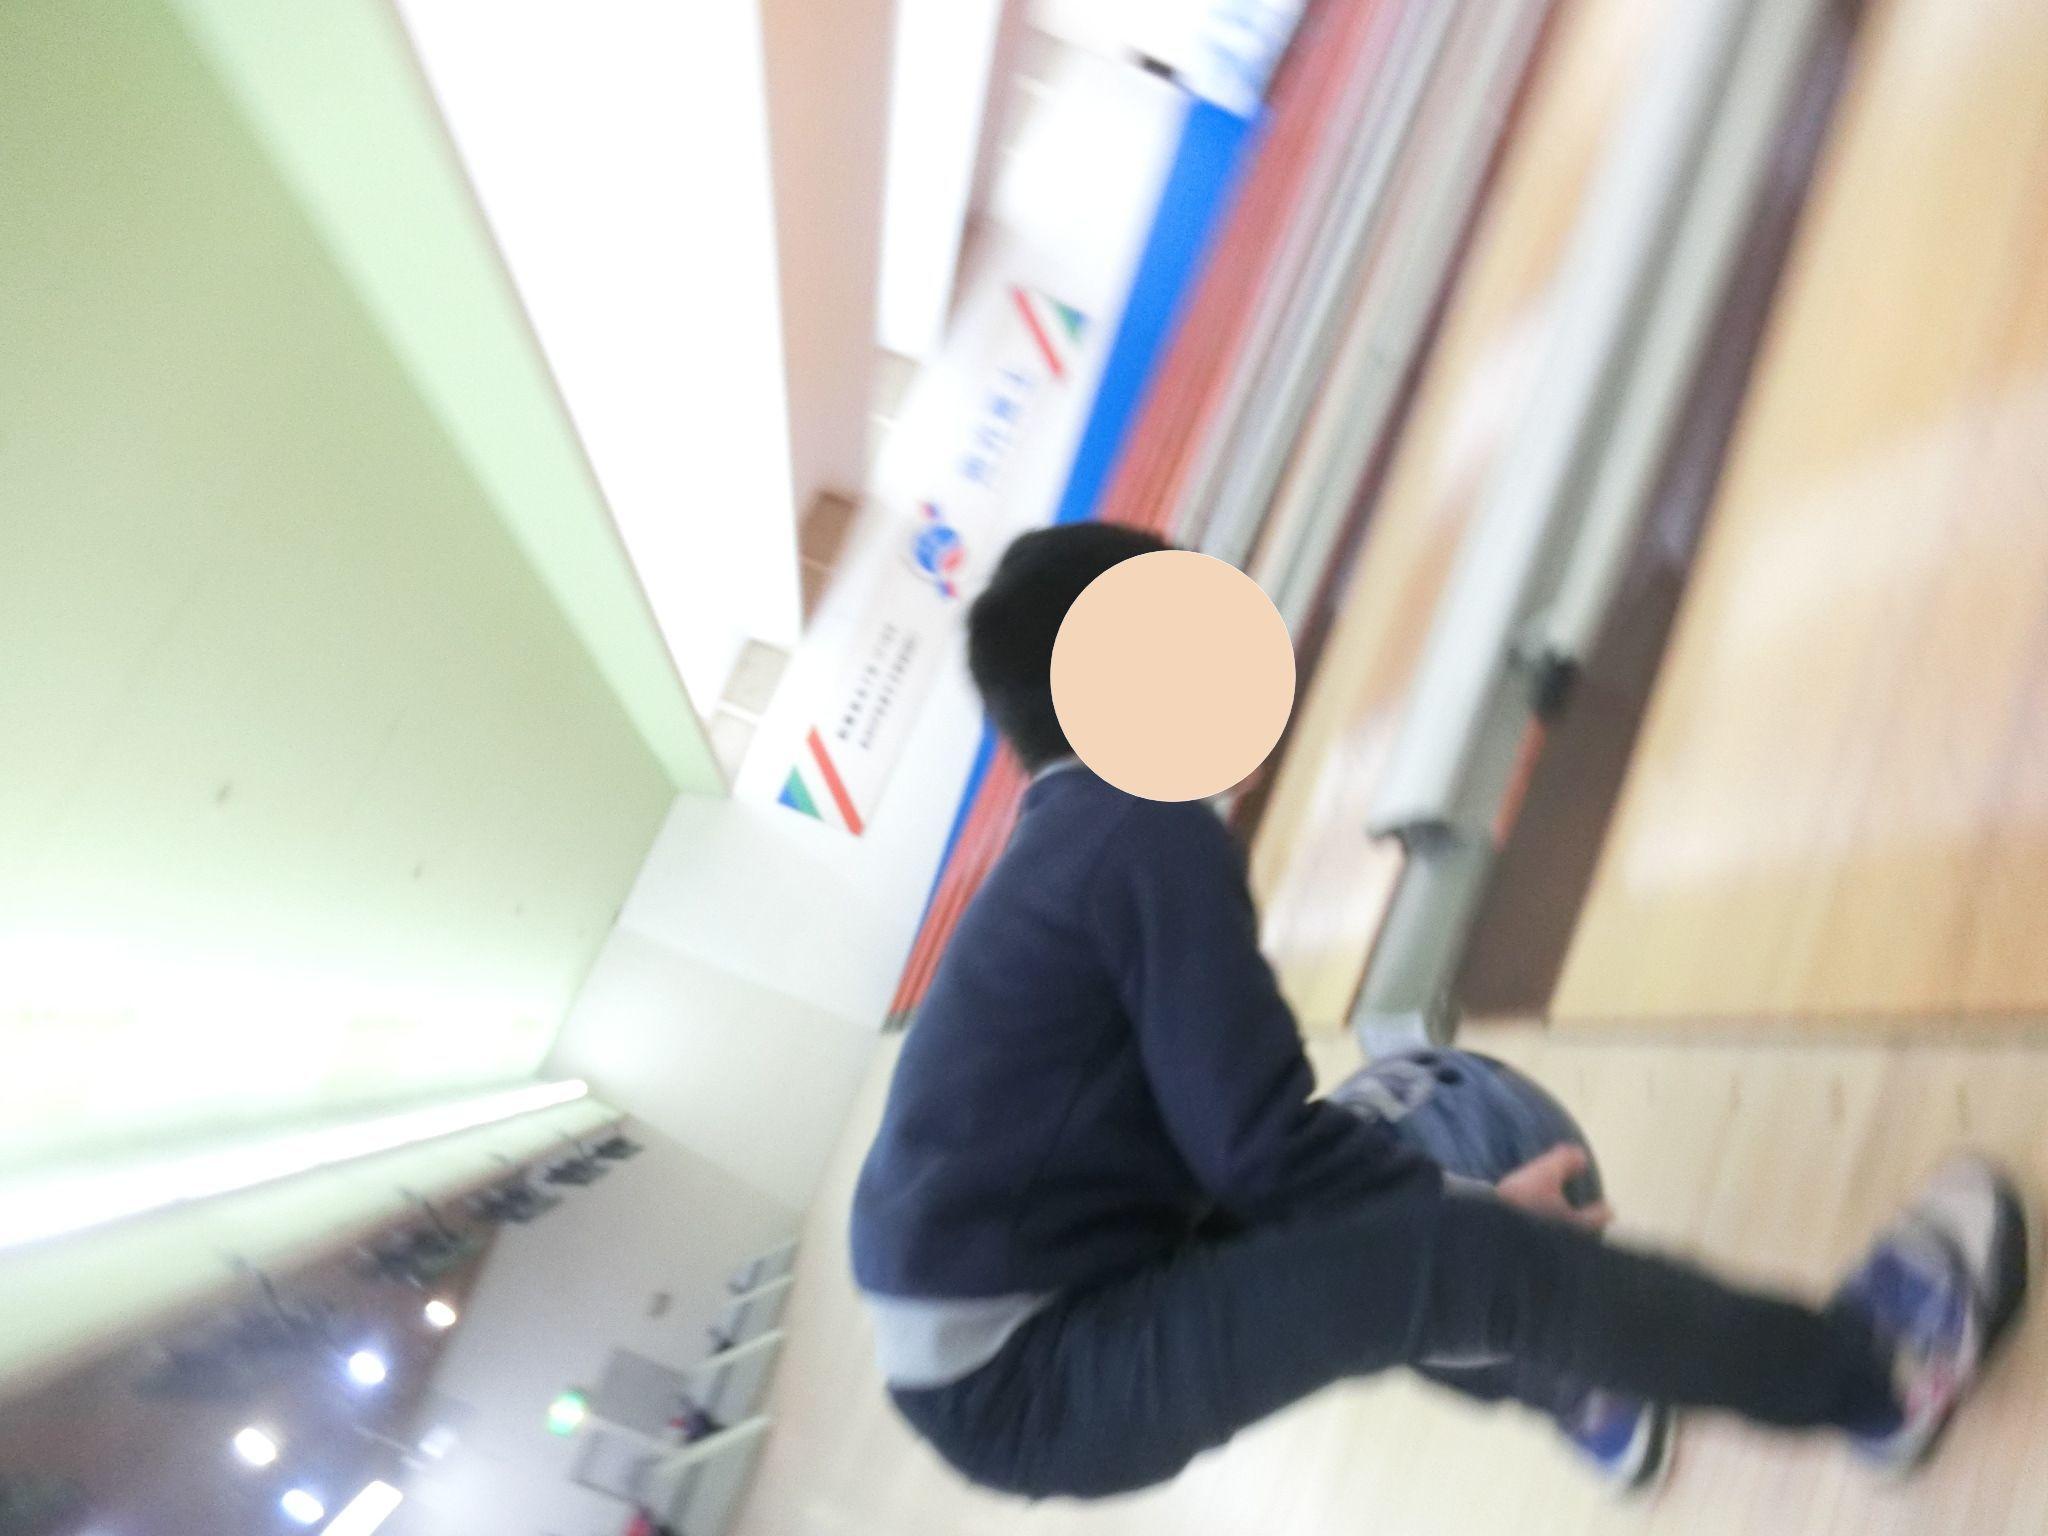 c0342050_16493114.jpg